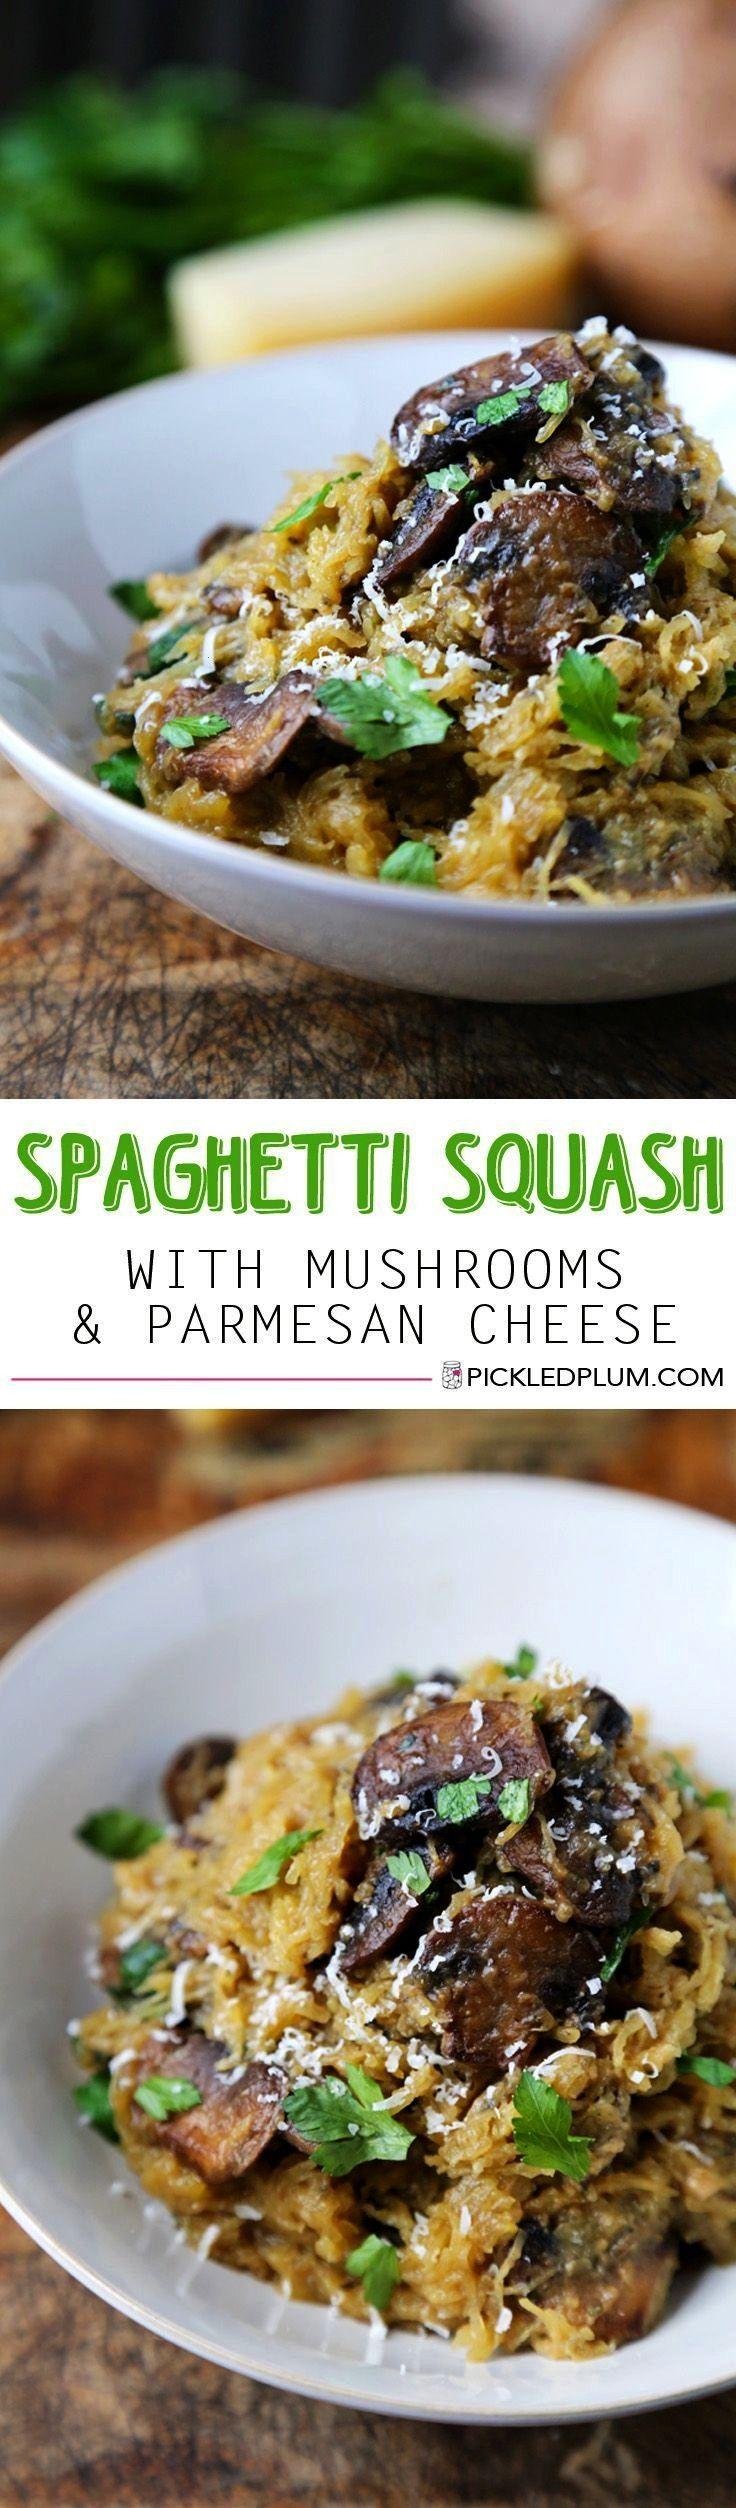 Parmesan Spaghetti Squash with Mushrooms ,  Garlic Parmesan Spaghetti Squash with Mushrooms , Garli